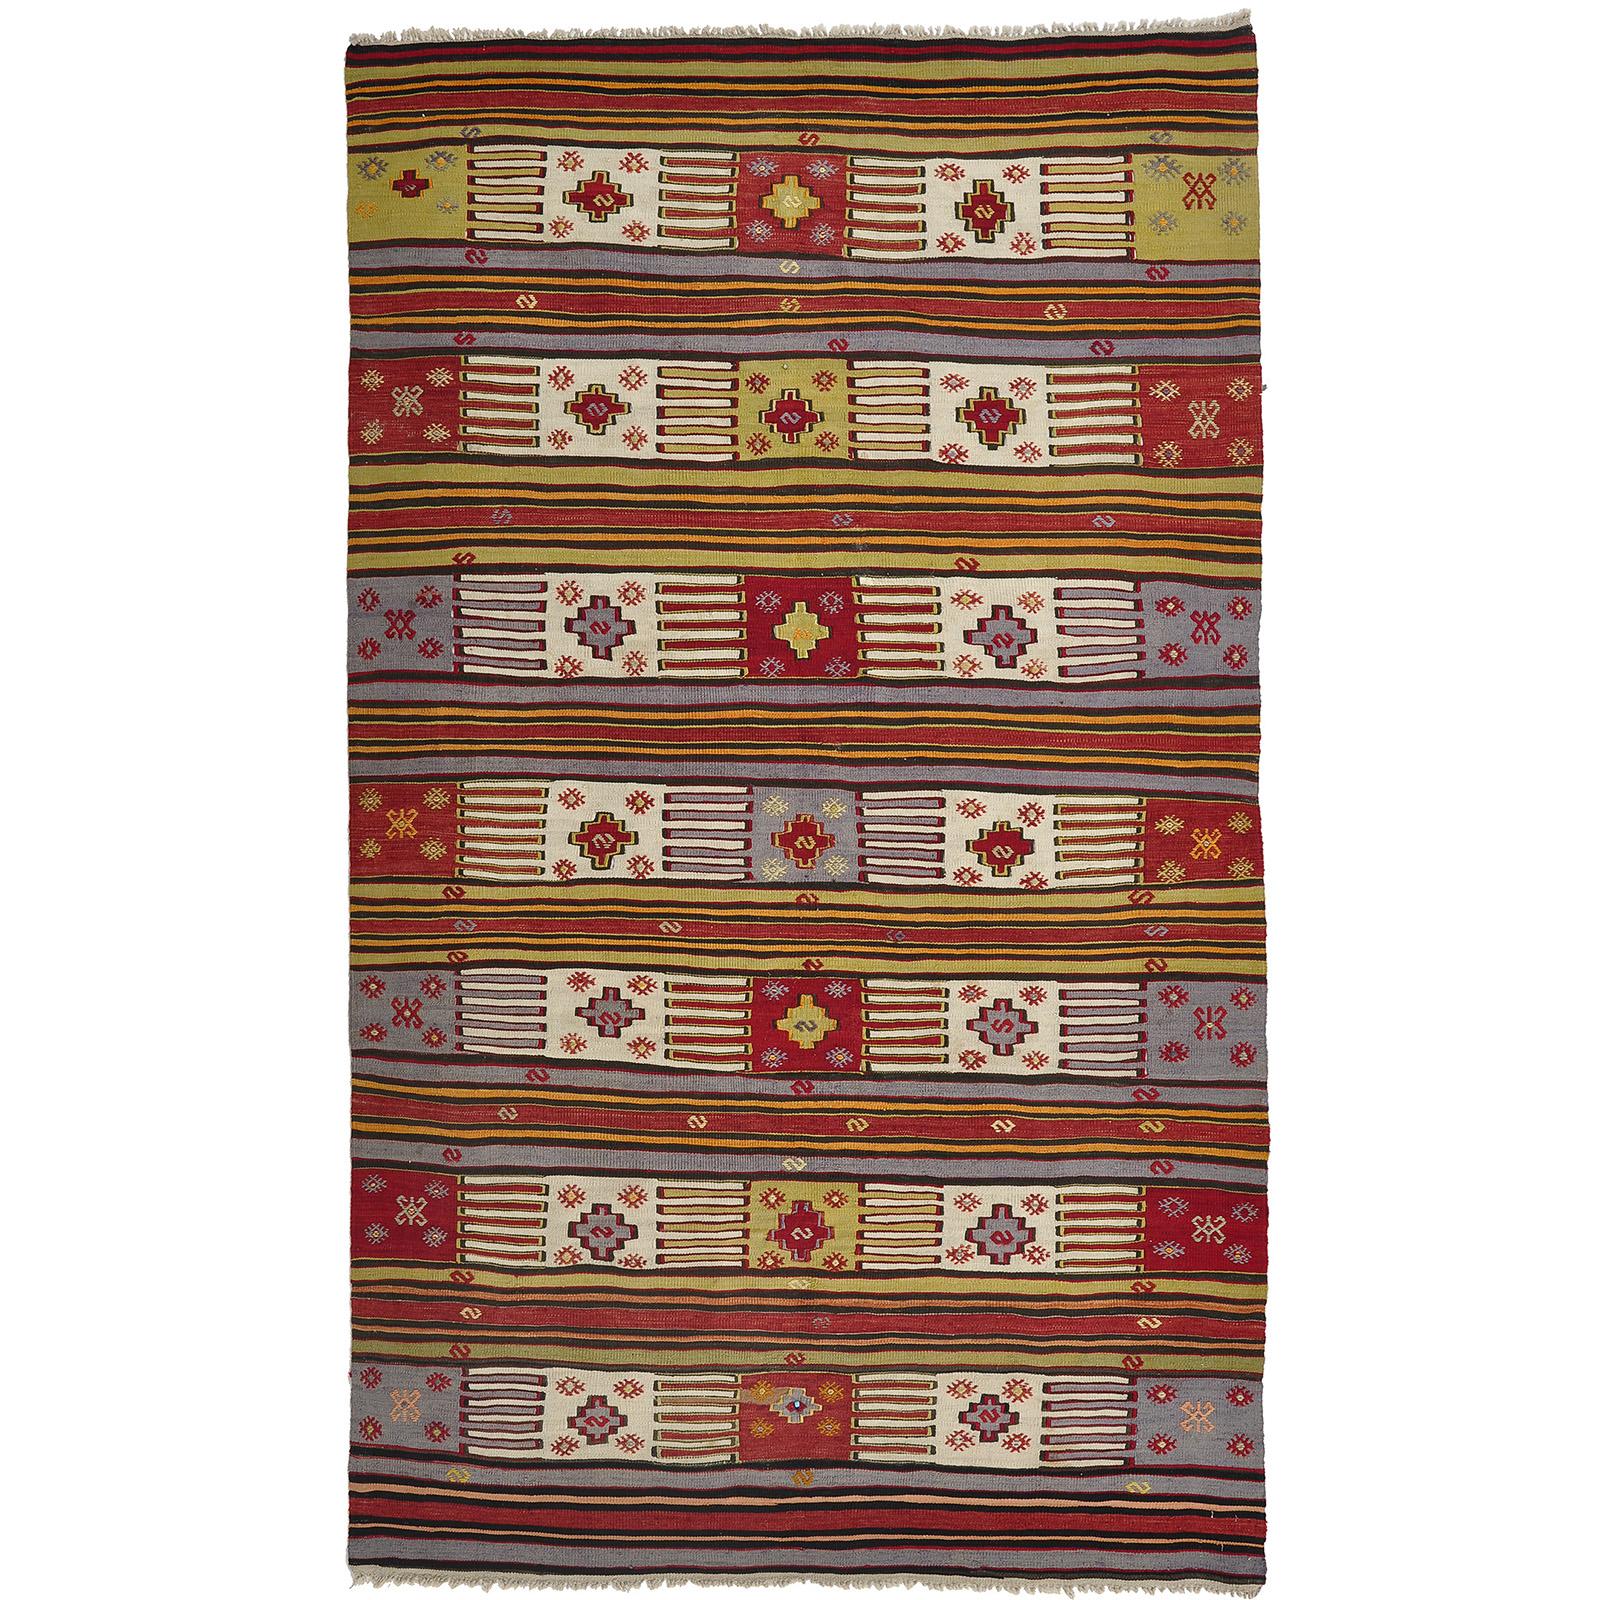 Kelim (old) matta storlek 254x150 cm